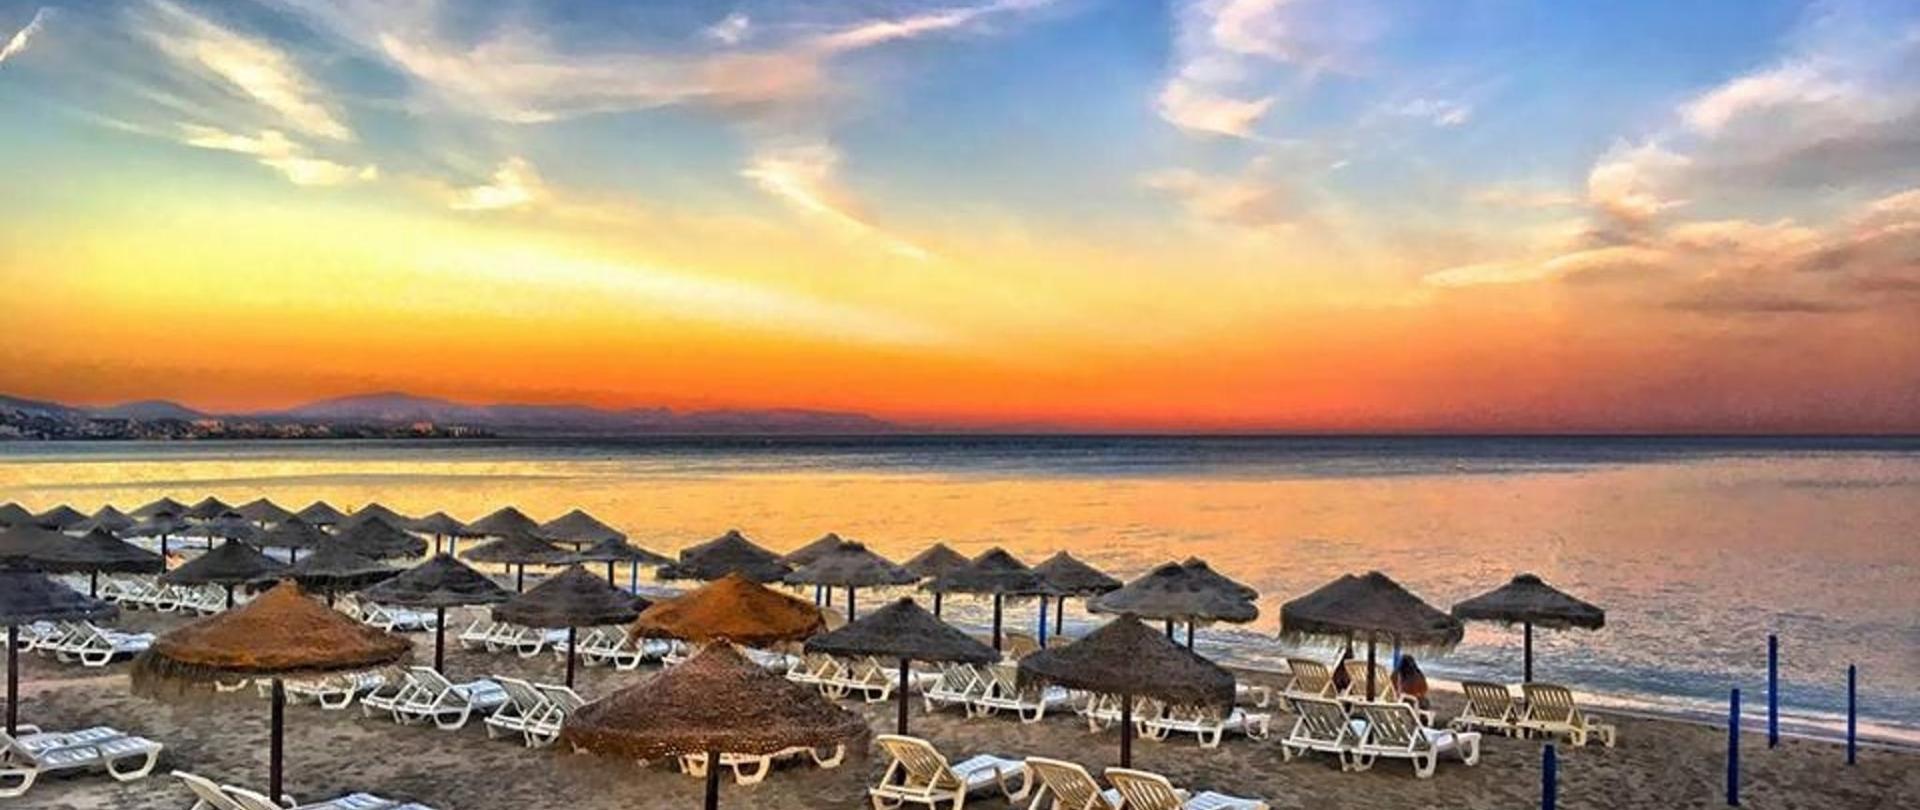 Playa Chula.JPG